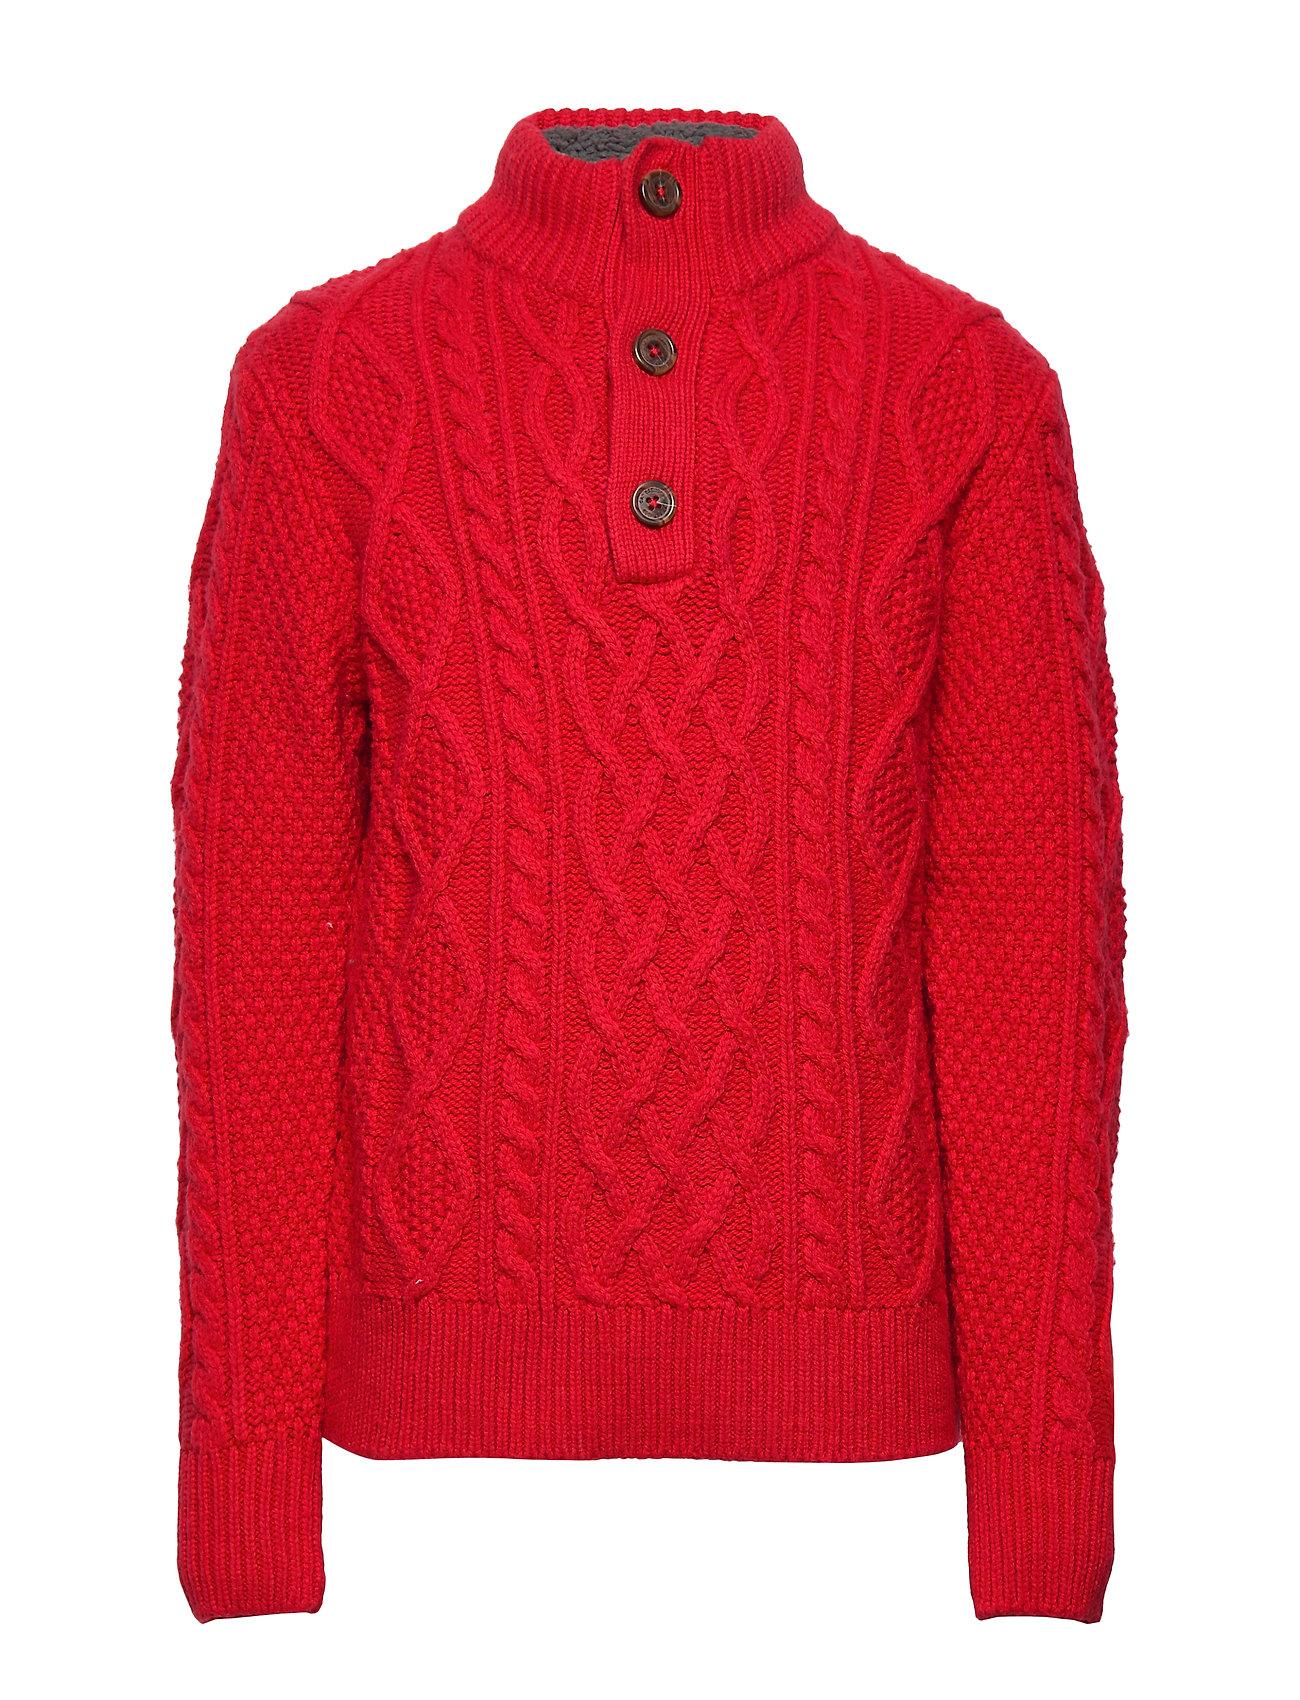 GAP Kids Cable-Knit Mockneck Sweater - MODERN RED 2